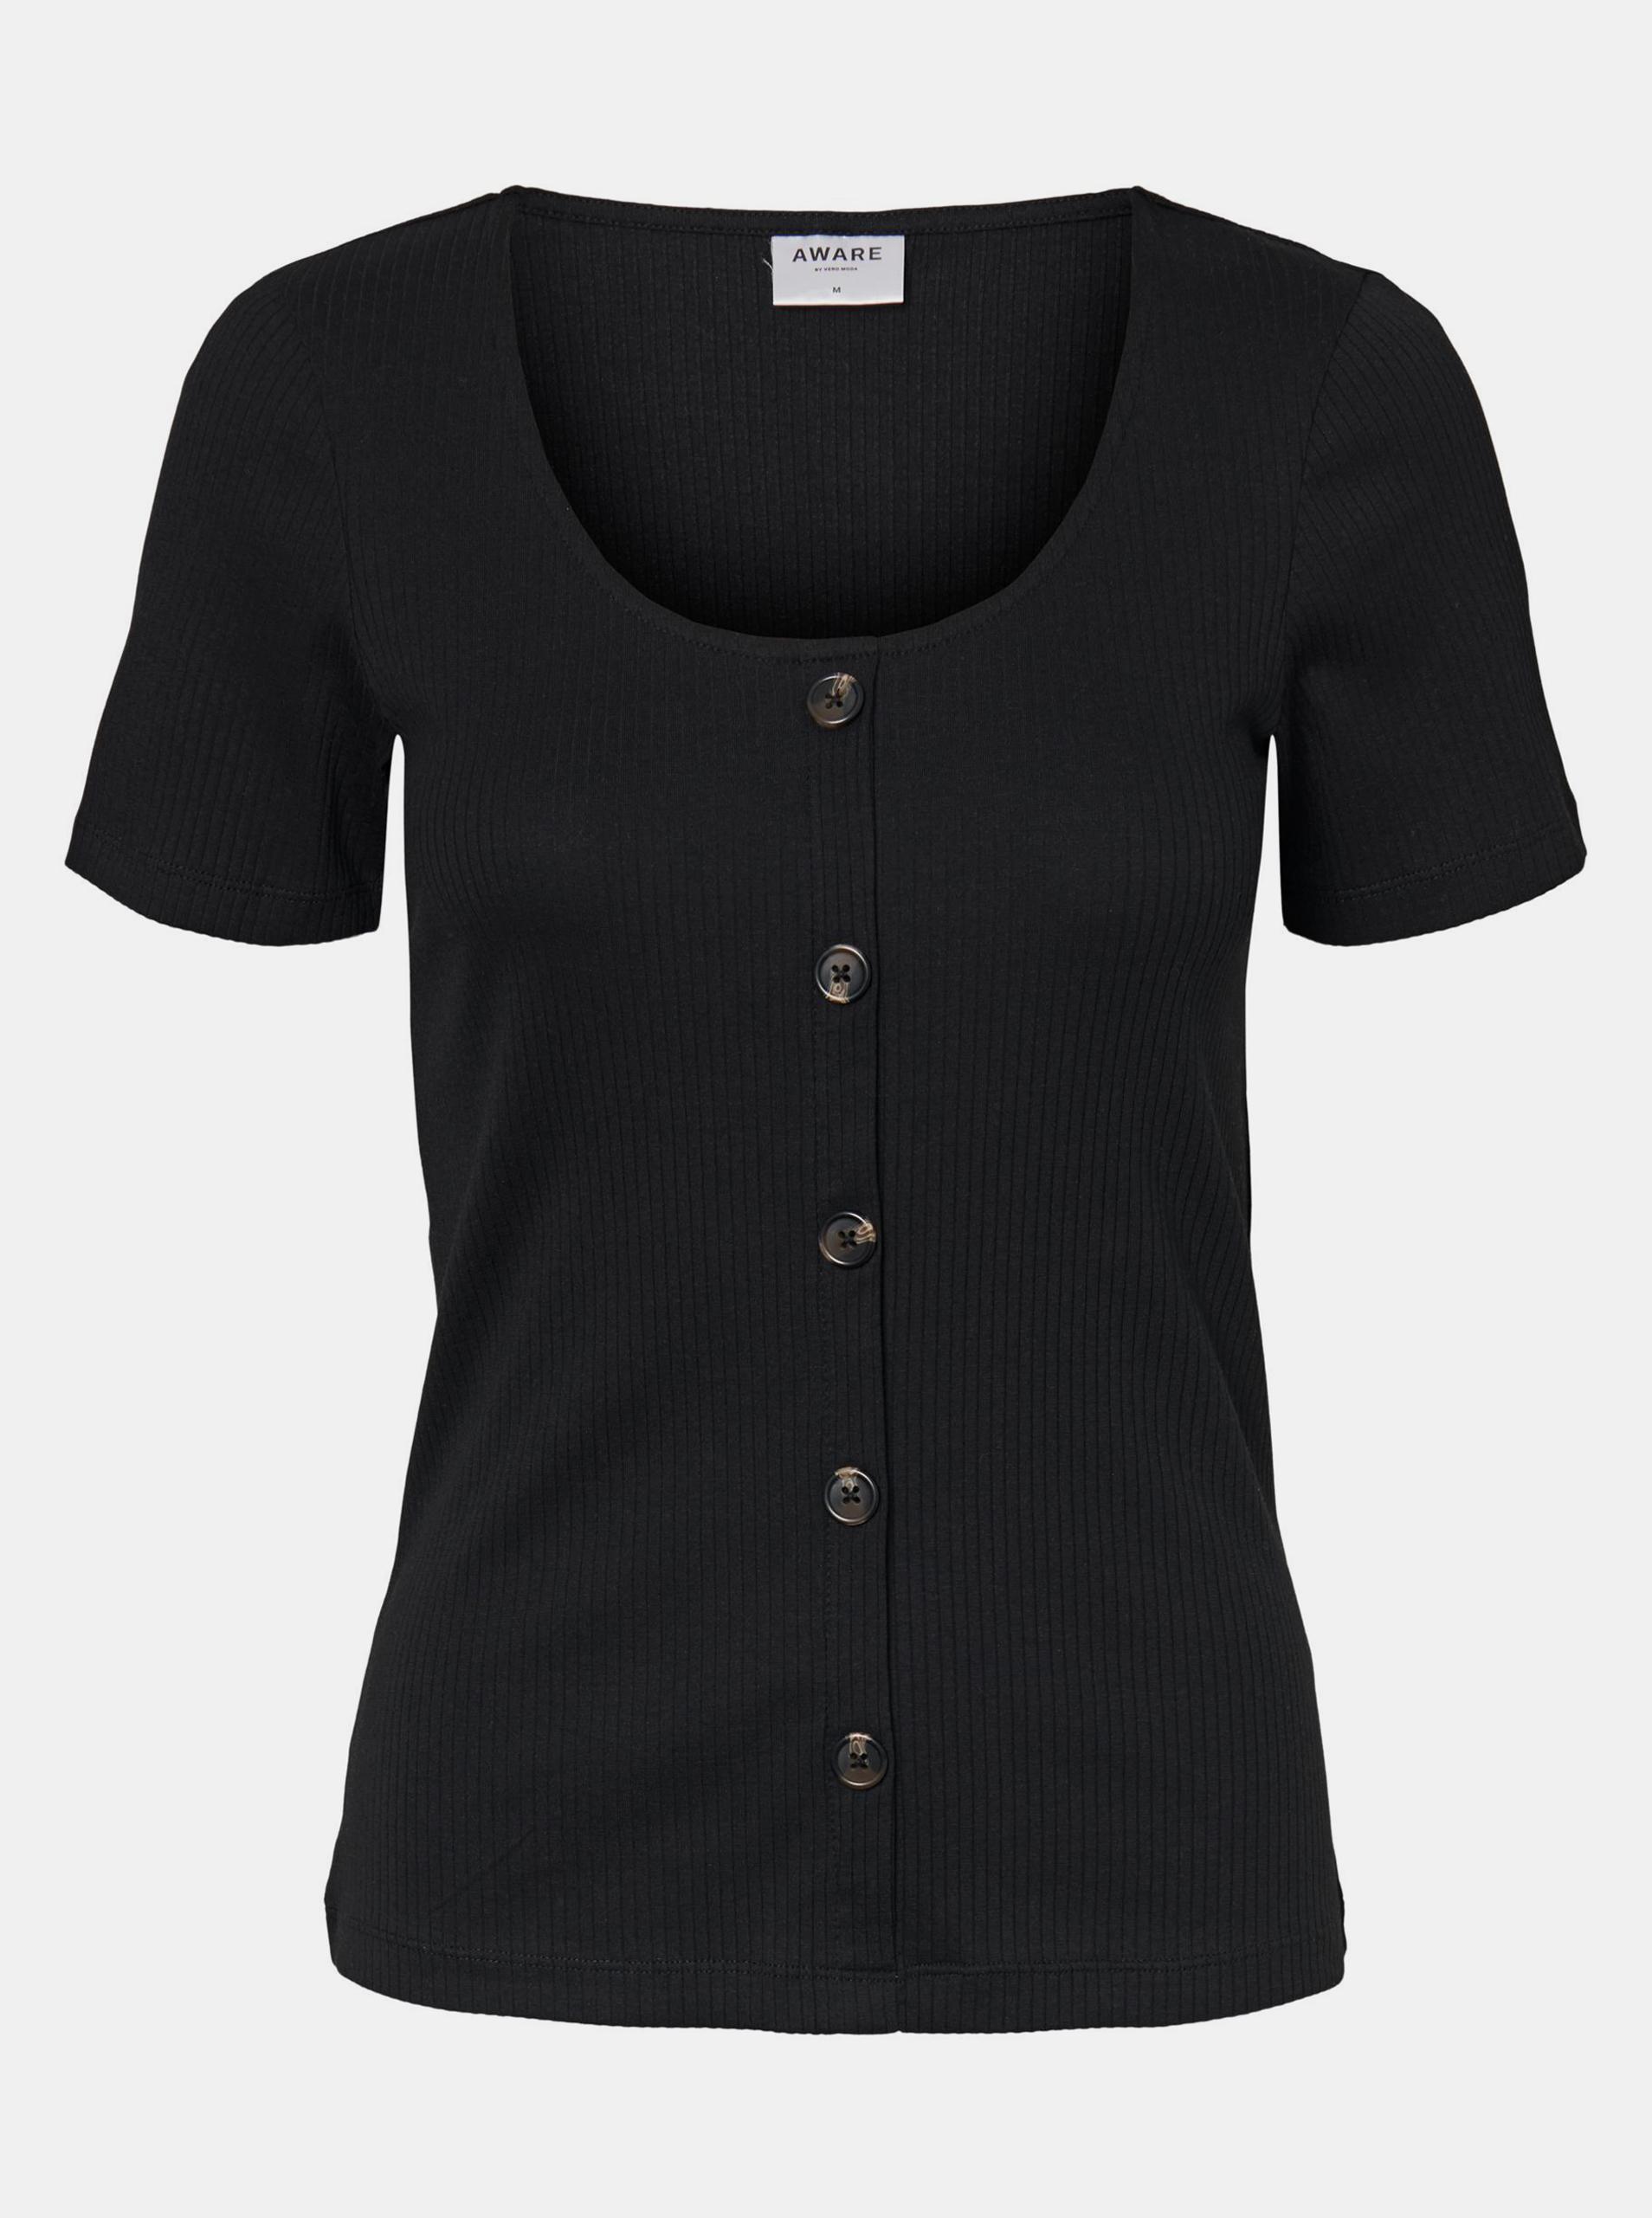 Vero Moda black T-shirt Helsinki